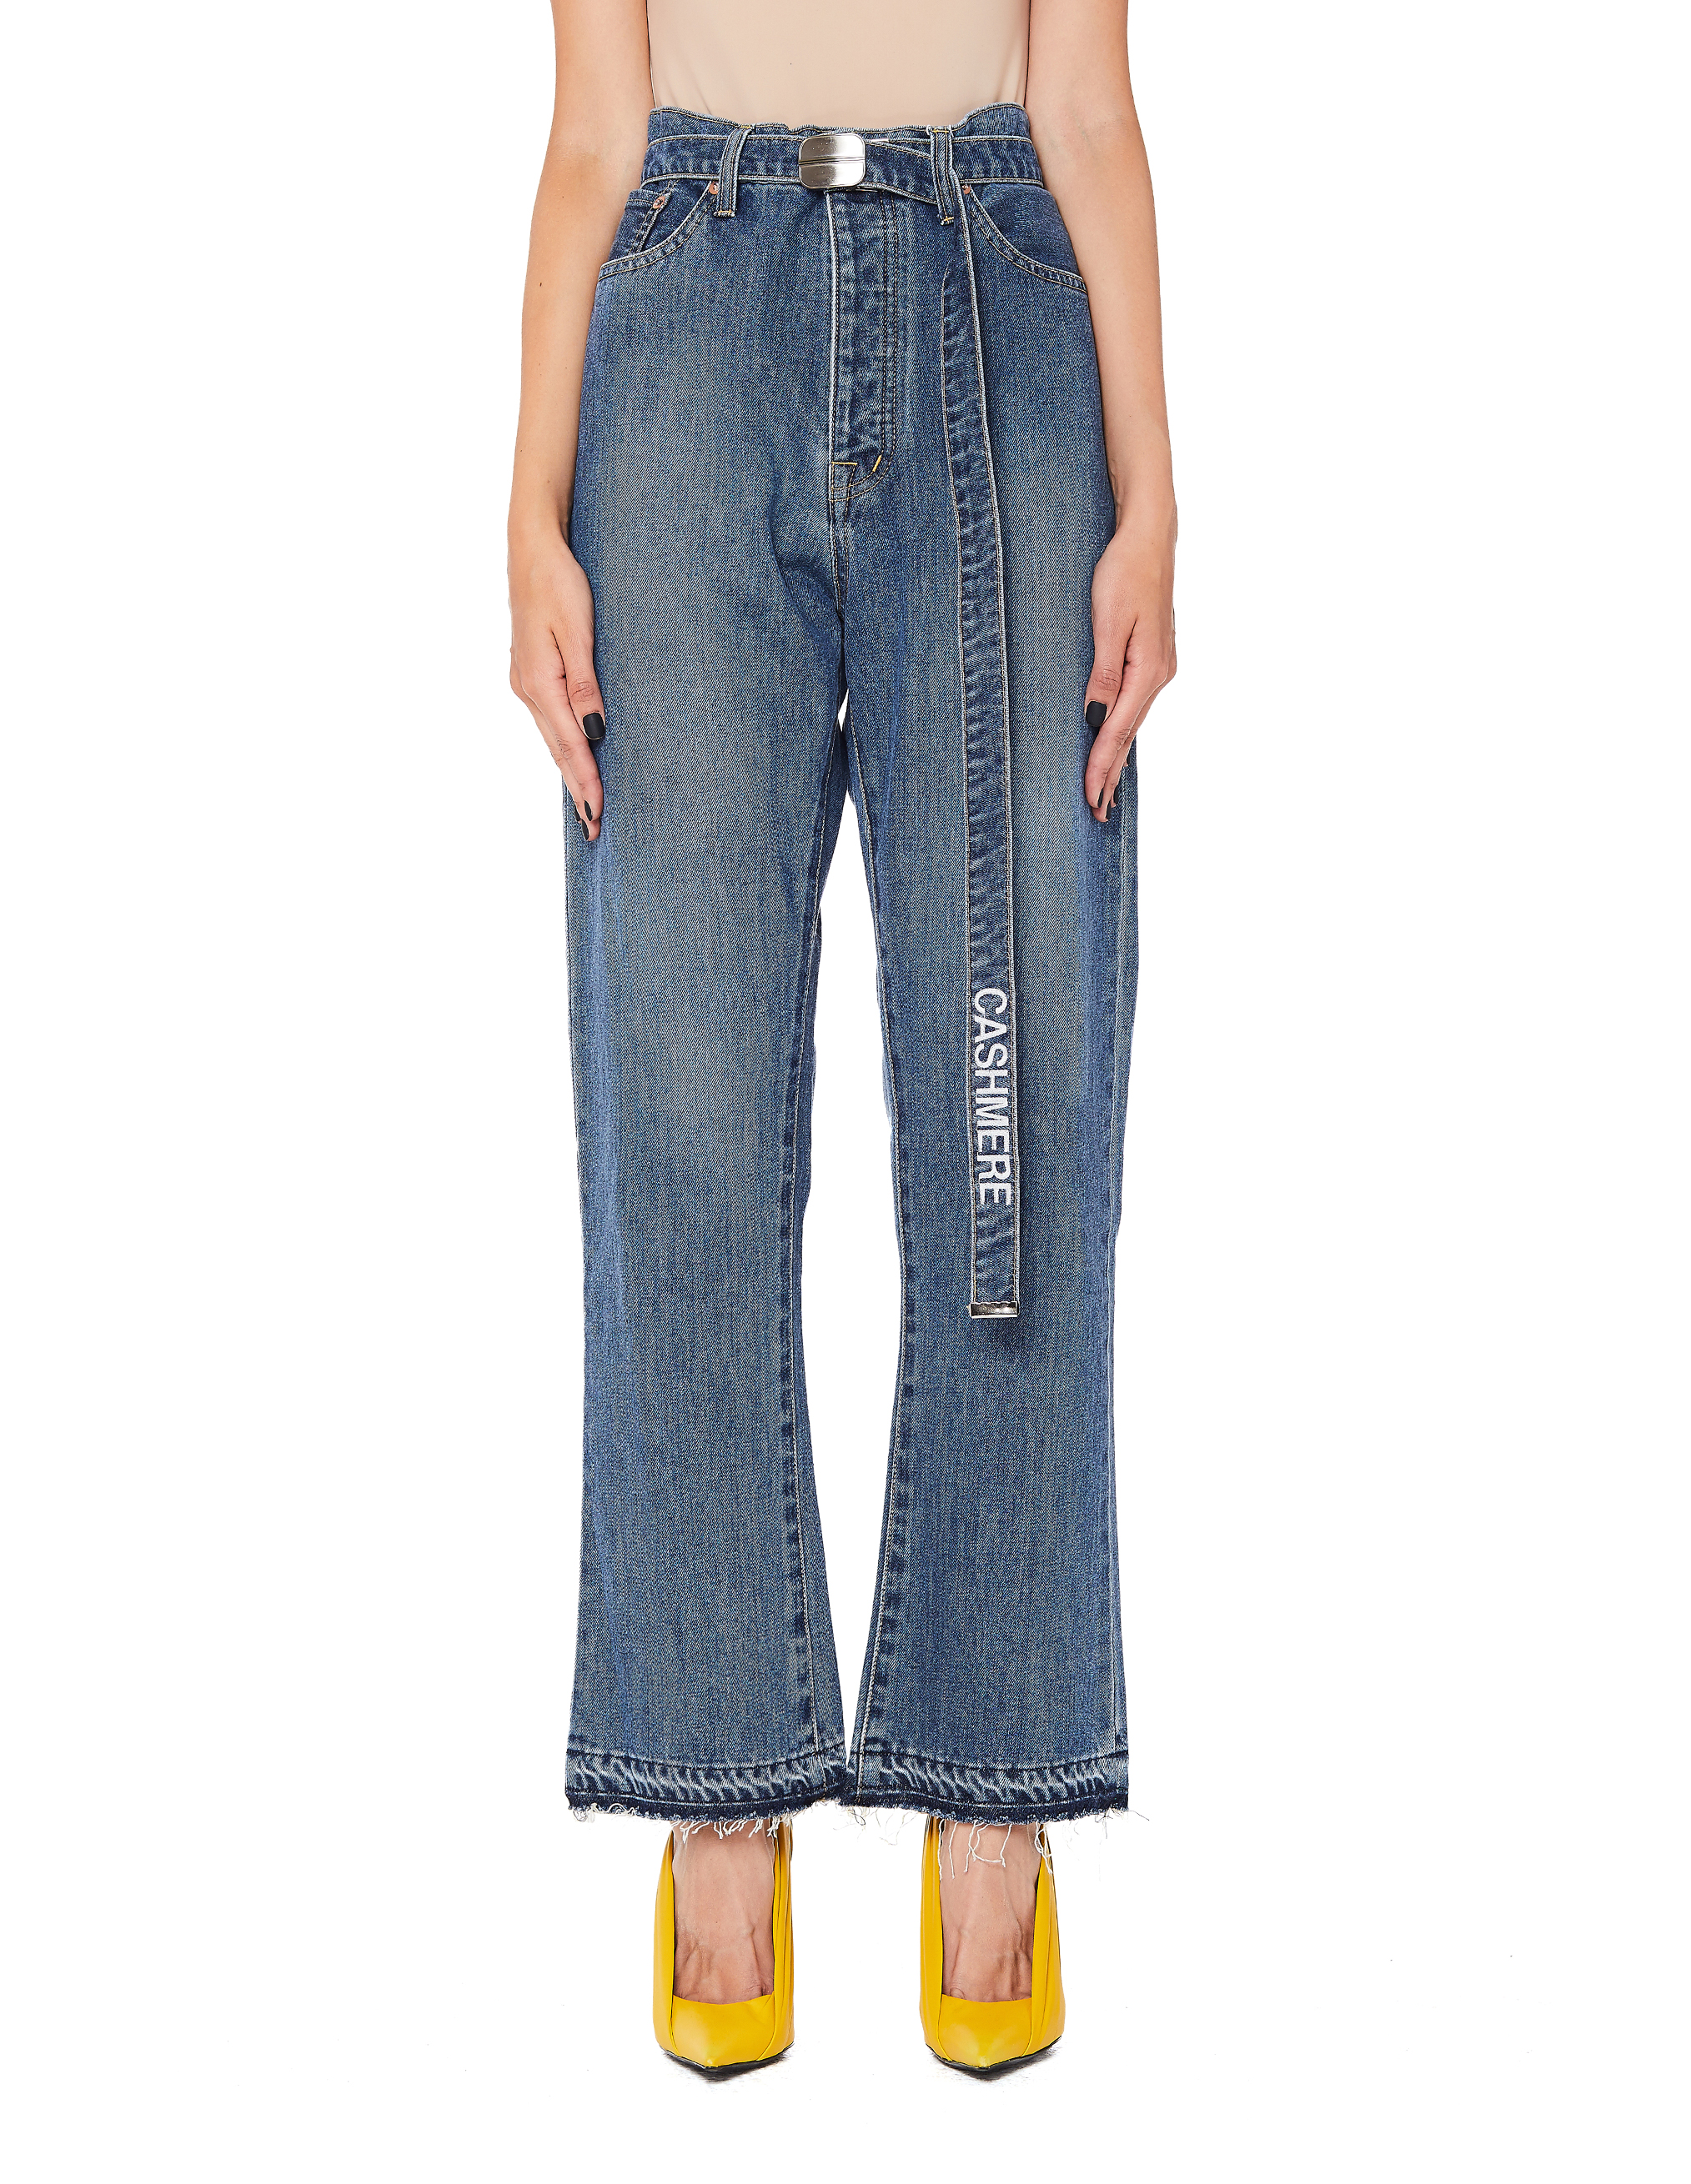 Doublet Blue Cotton & Cashmere Belted Jeans